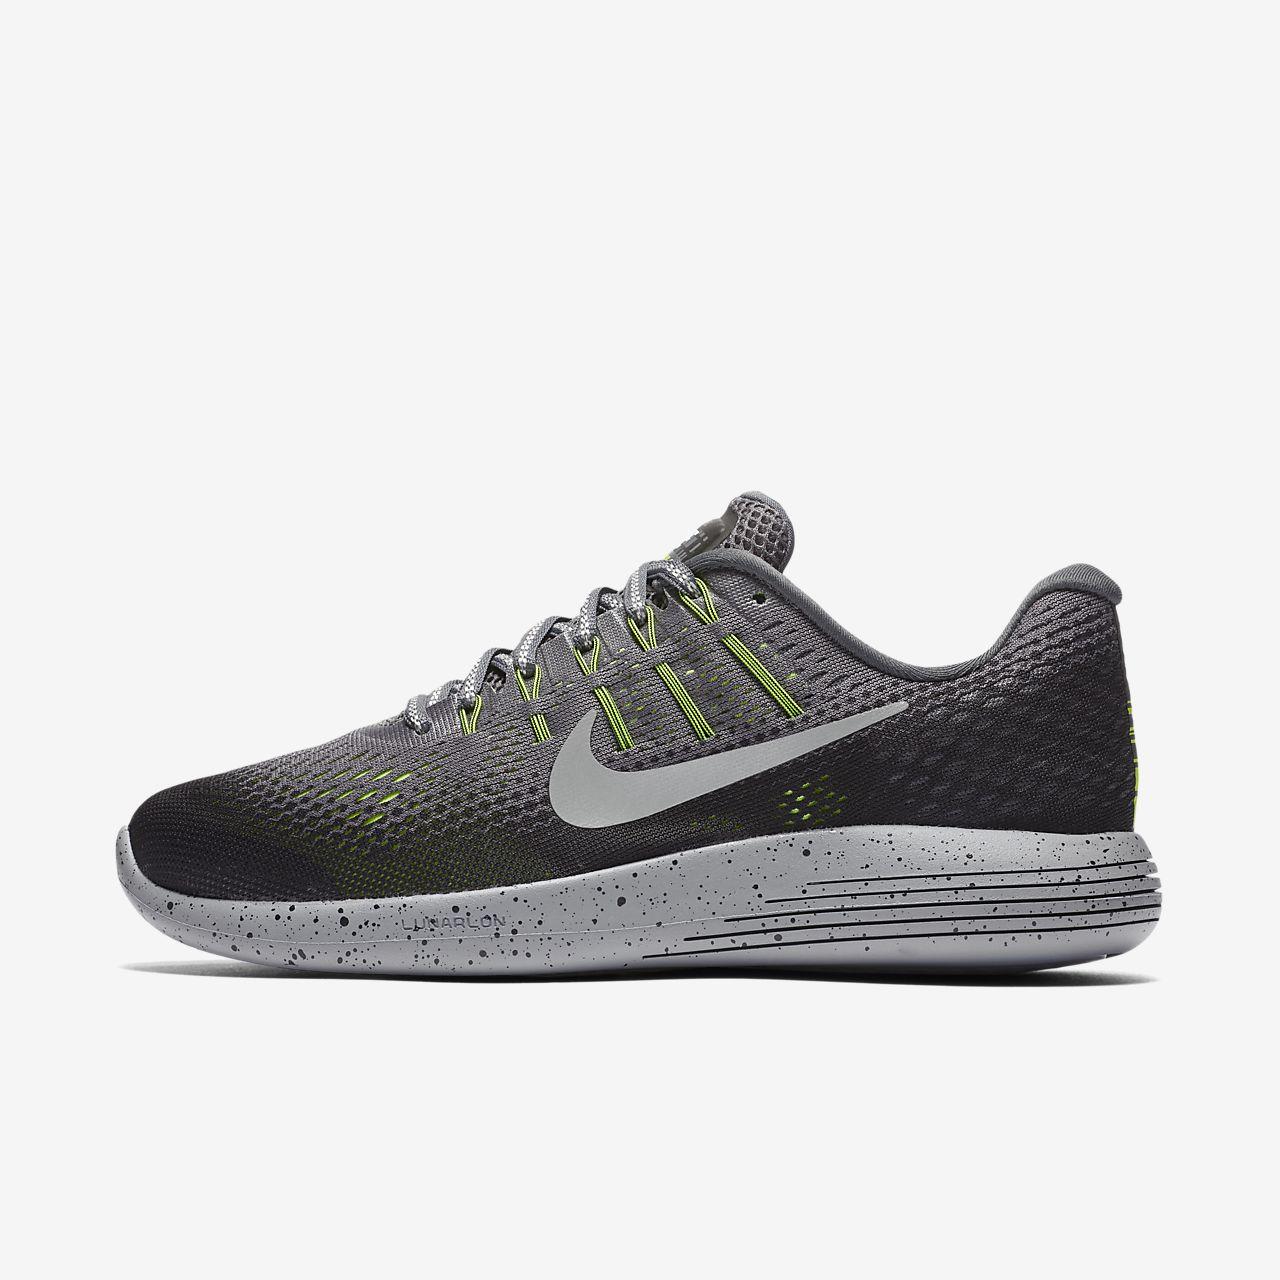 explorer sortie Nike Lunarglide 8 Bouclier Chaussures De Course wiki jeu oPxpx9E